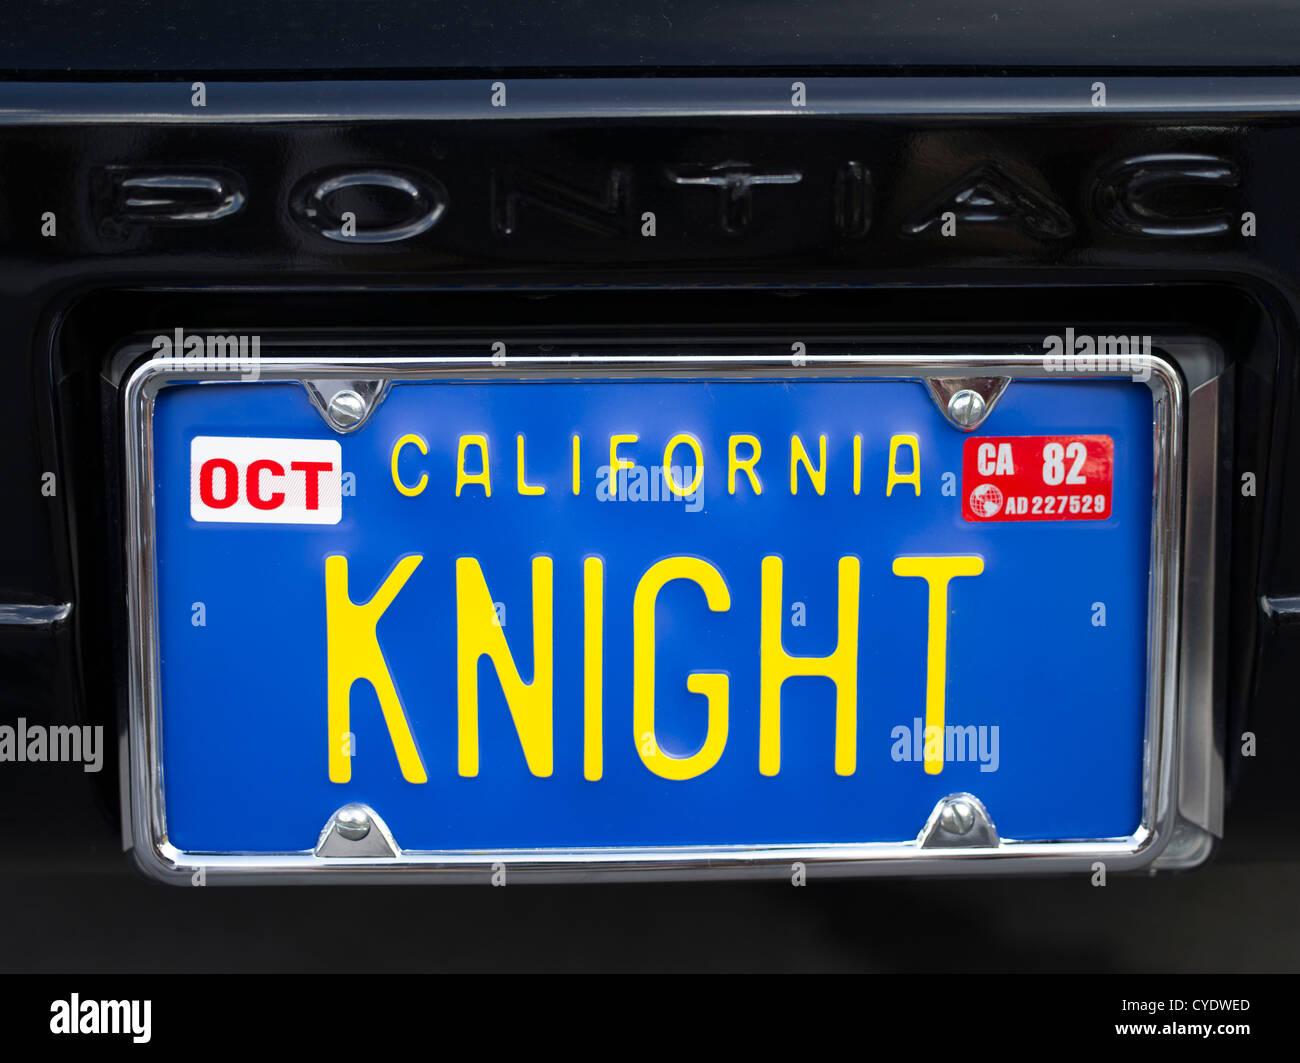 Knight Rider Tv Show Kitt Car License Plate Stock Photo